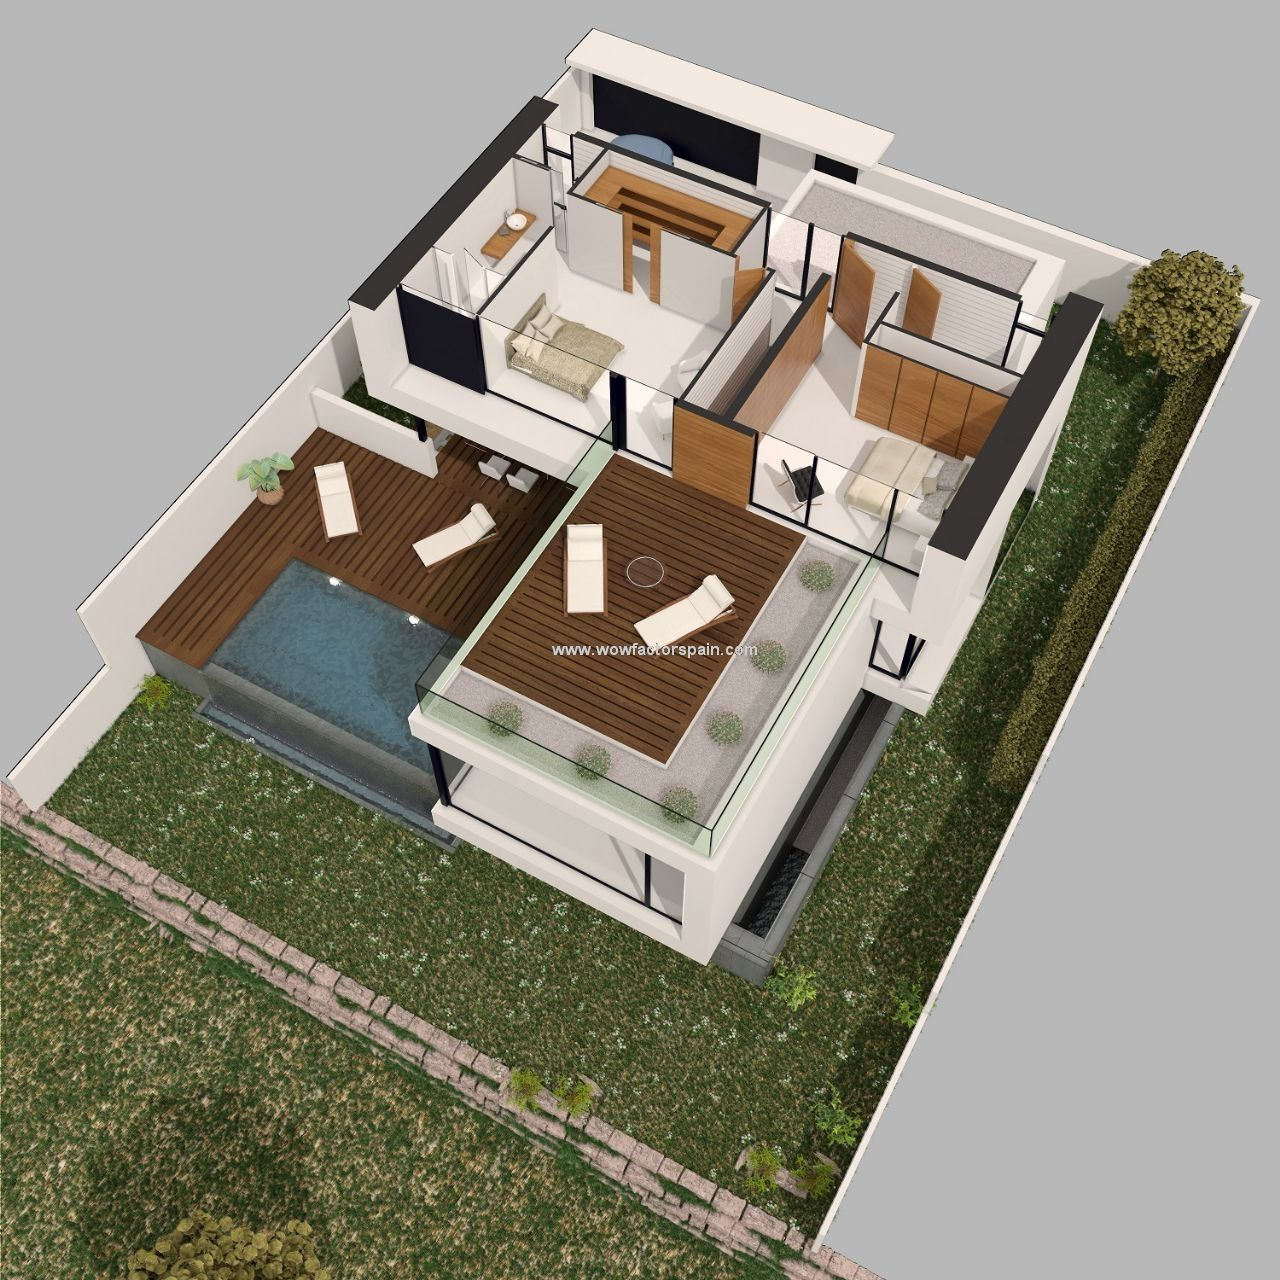 New Development Of Villas In Estepona 3d House Plans House Styles House Plans